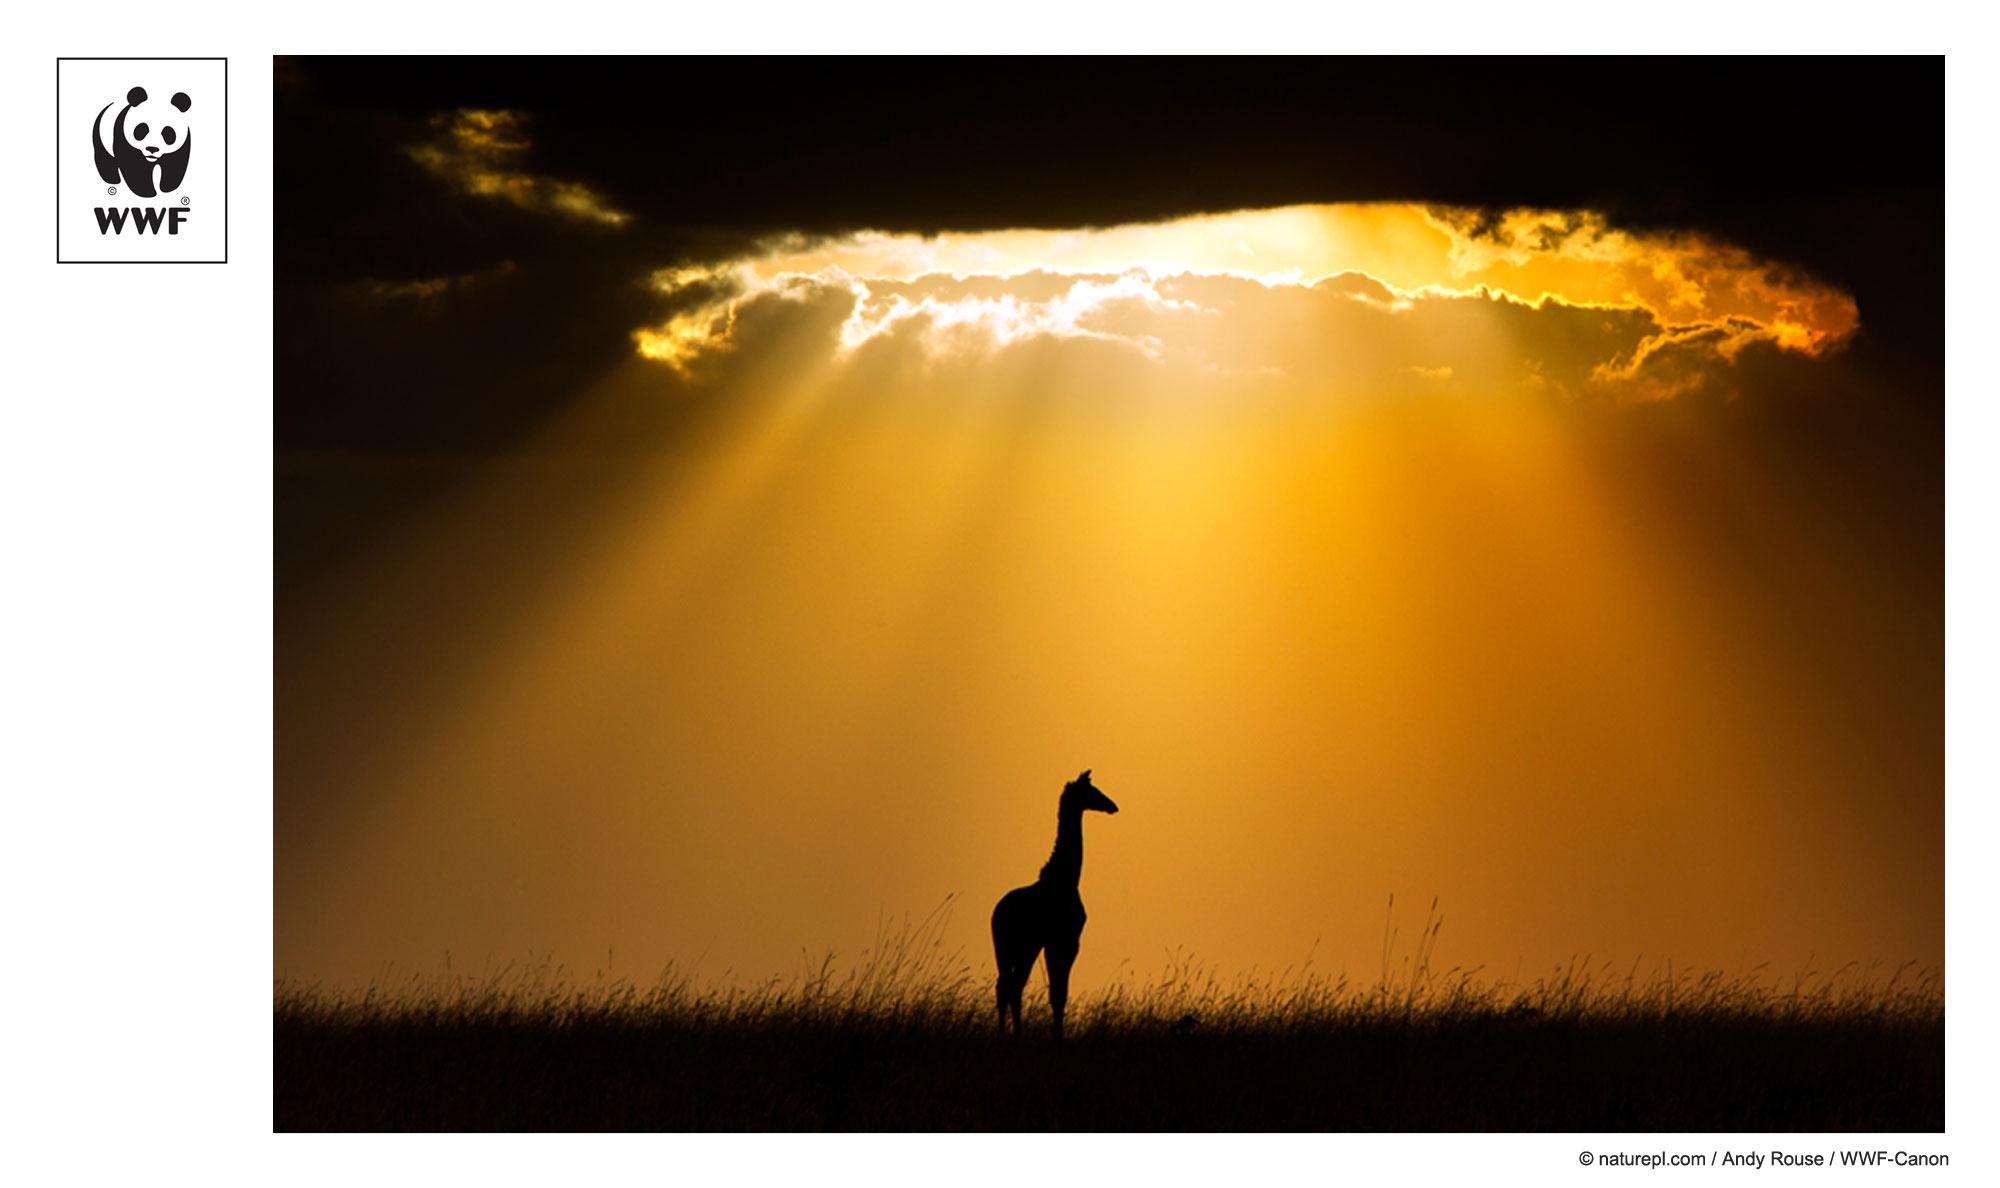 WWF-Canon Pic of the Week: Giraffe silhouetted by setting sun, Maasai Mara